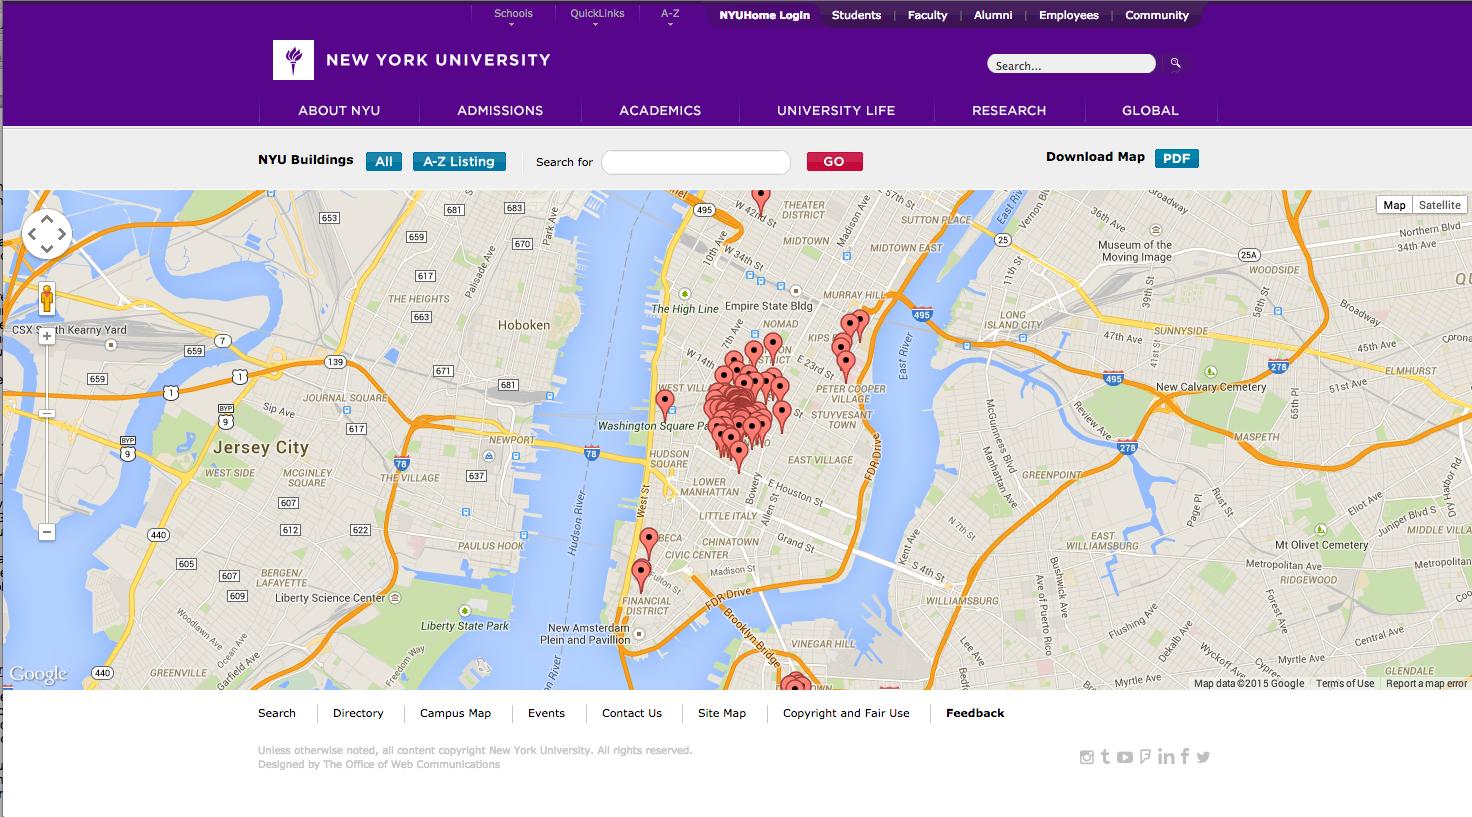 New York University interactive map